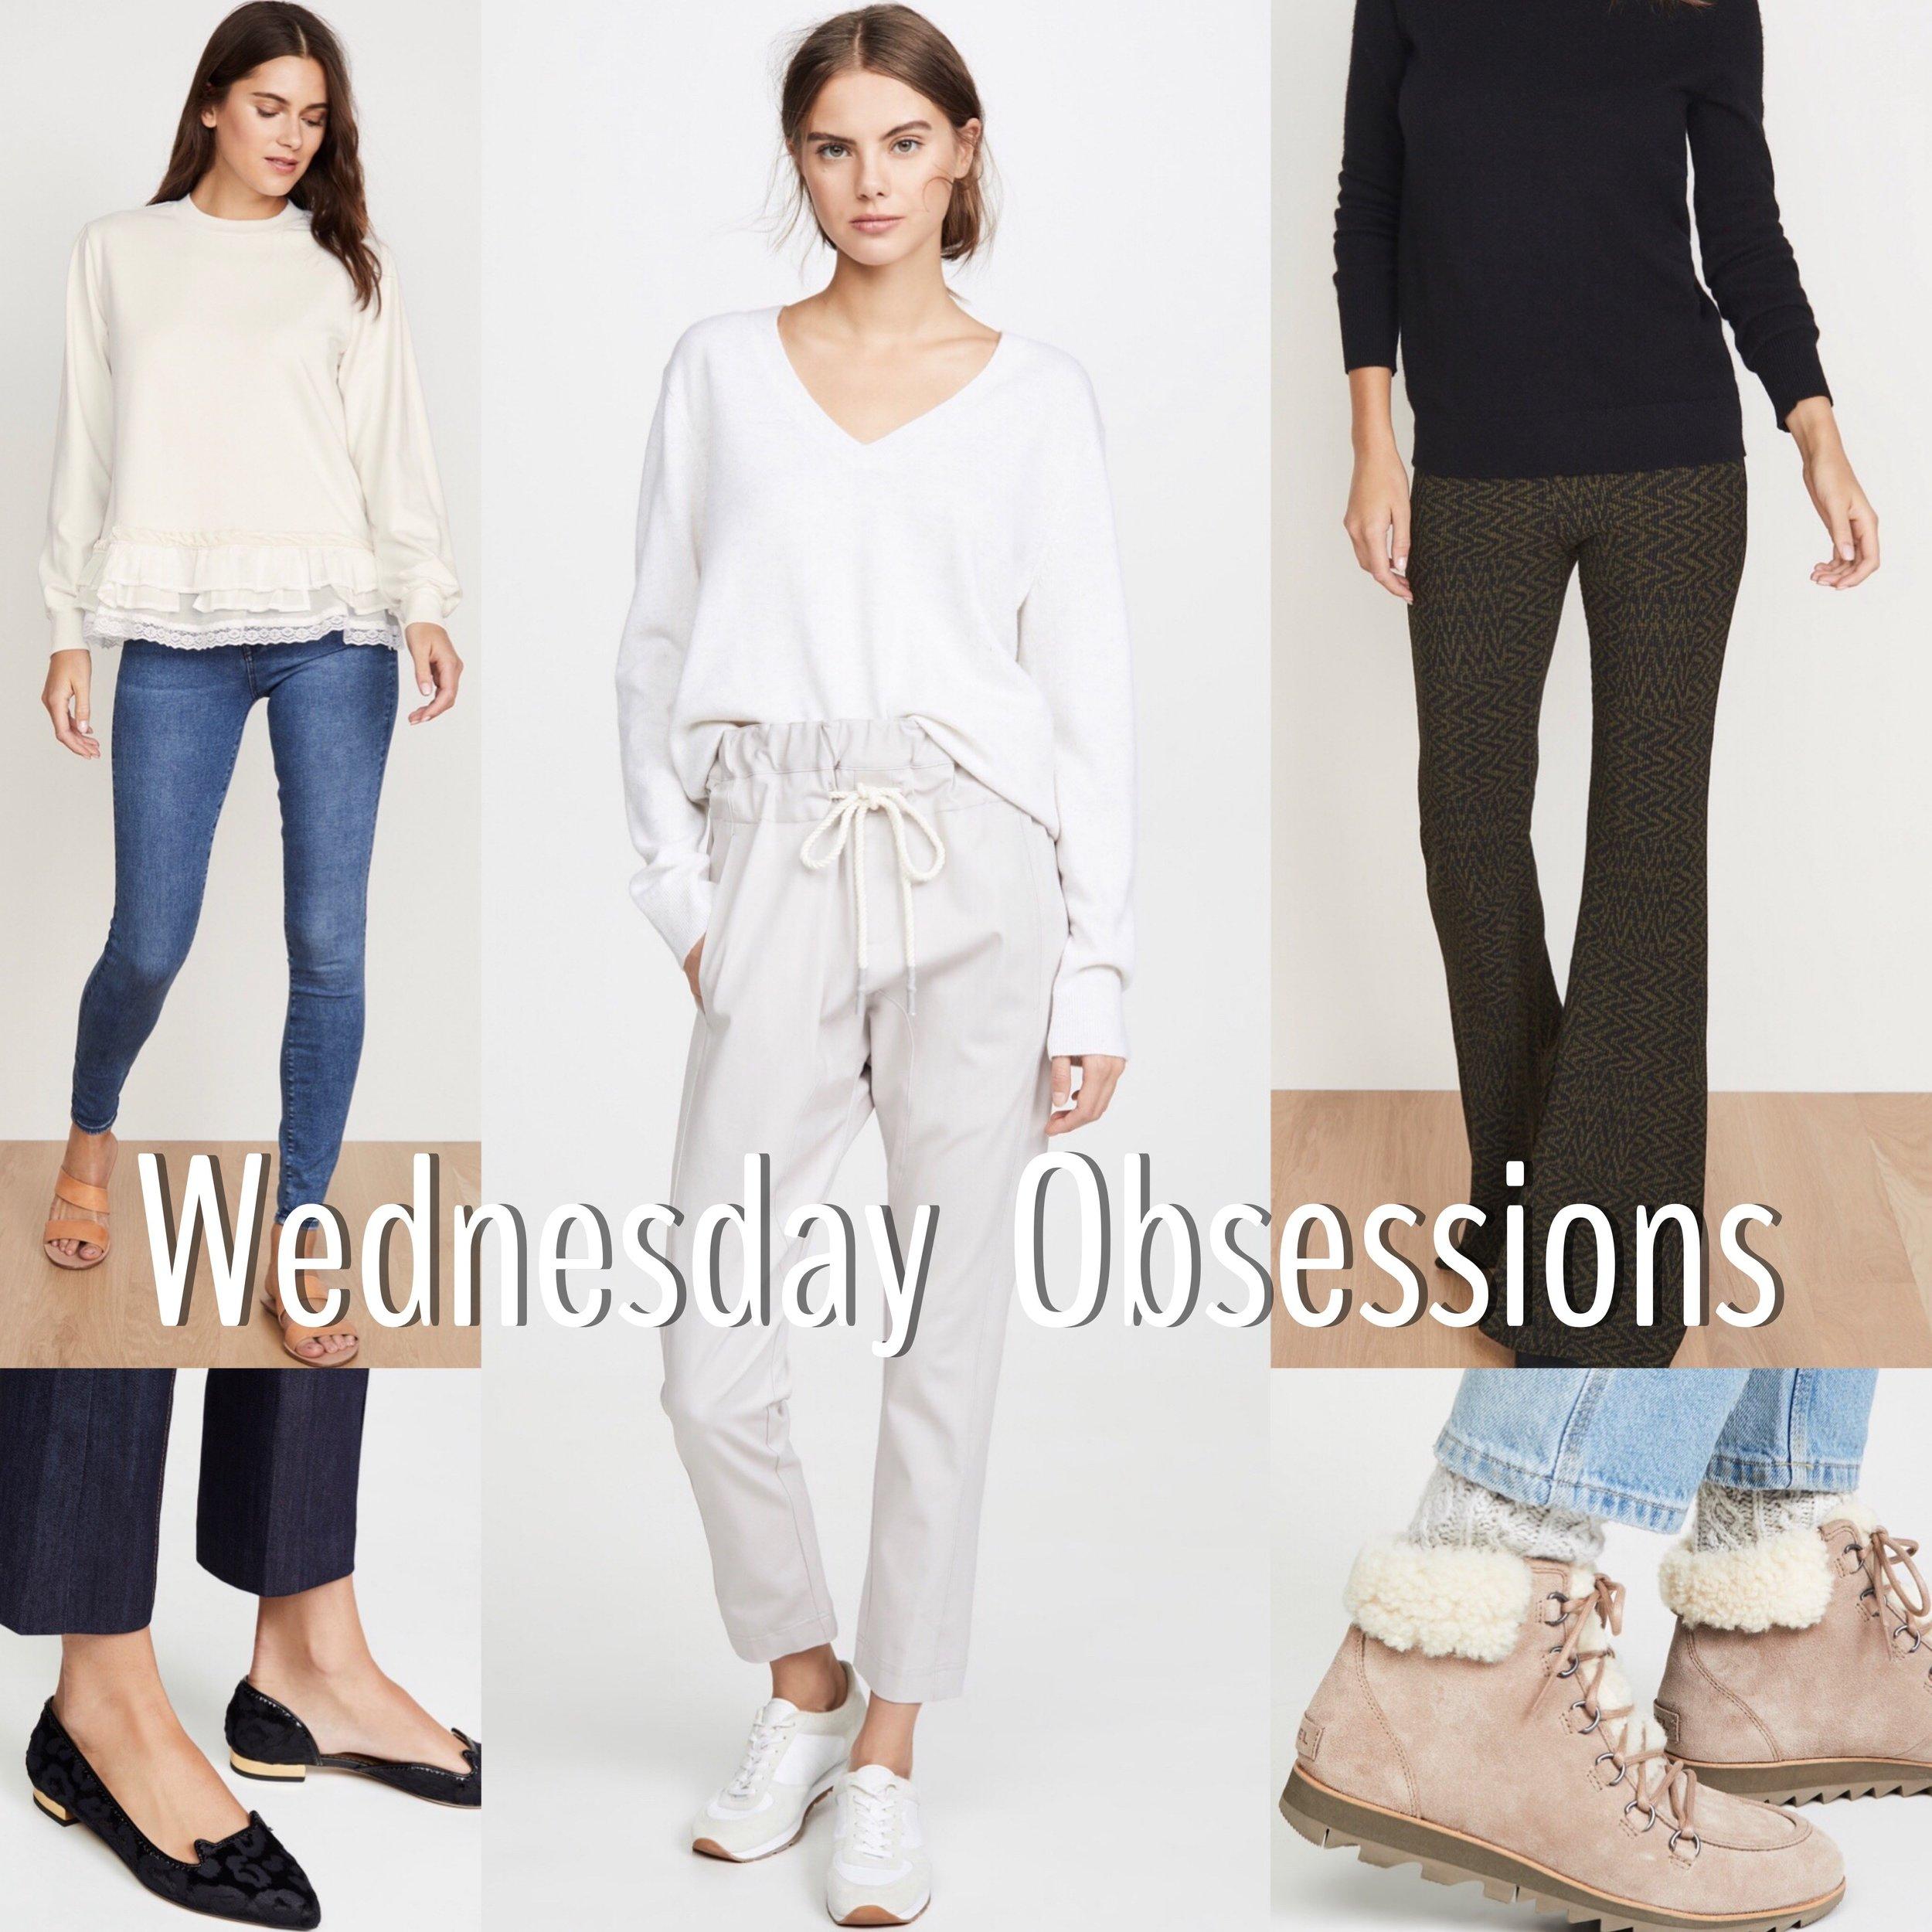 #1: Shirt; cluusa. Shoes; charlotteolympia.  #2: Pants; bassike. Shoes; shopbop. #3: Pants; beaufille. Shoes; sorelfootwear